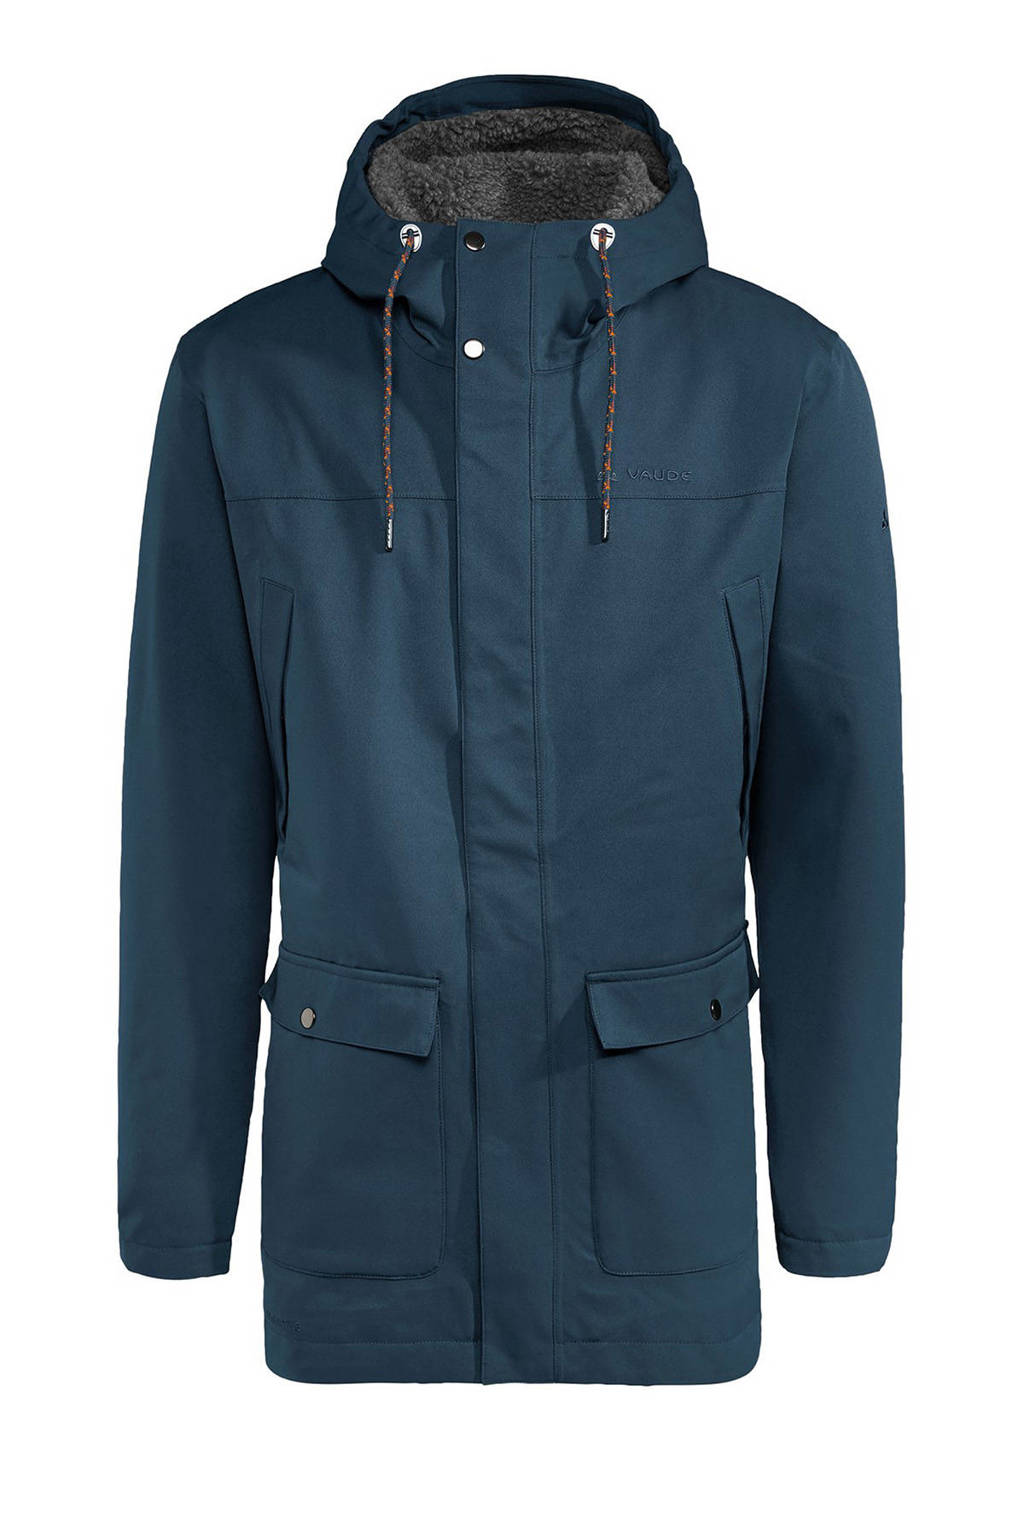 VAUDE outdoor jas Manukau donkerblauw, Donkerblauw